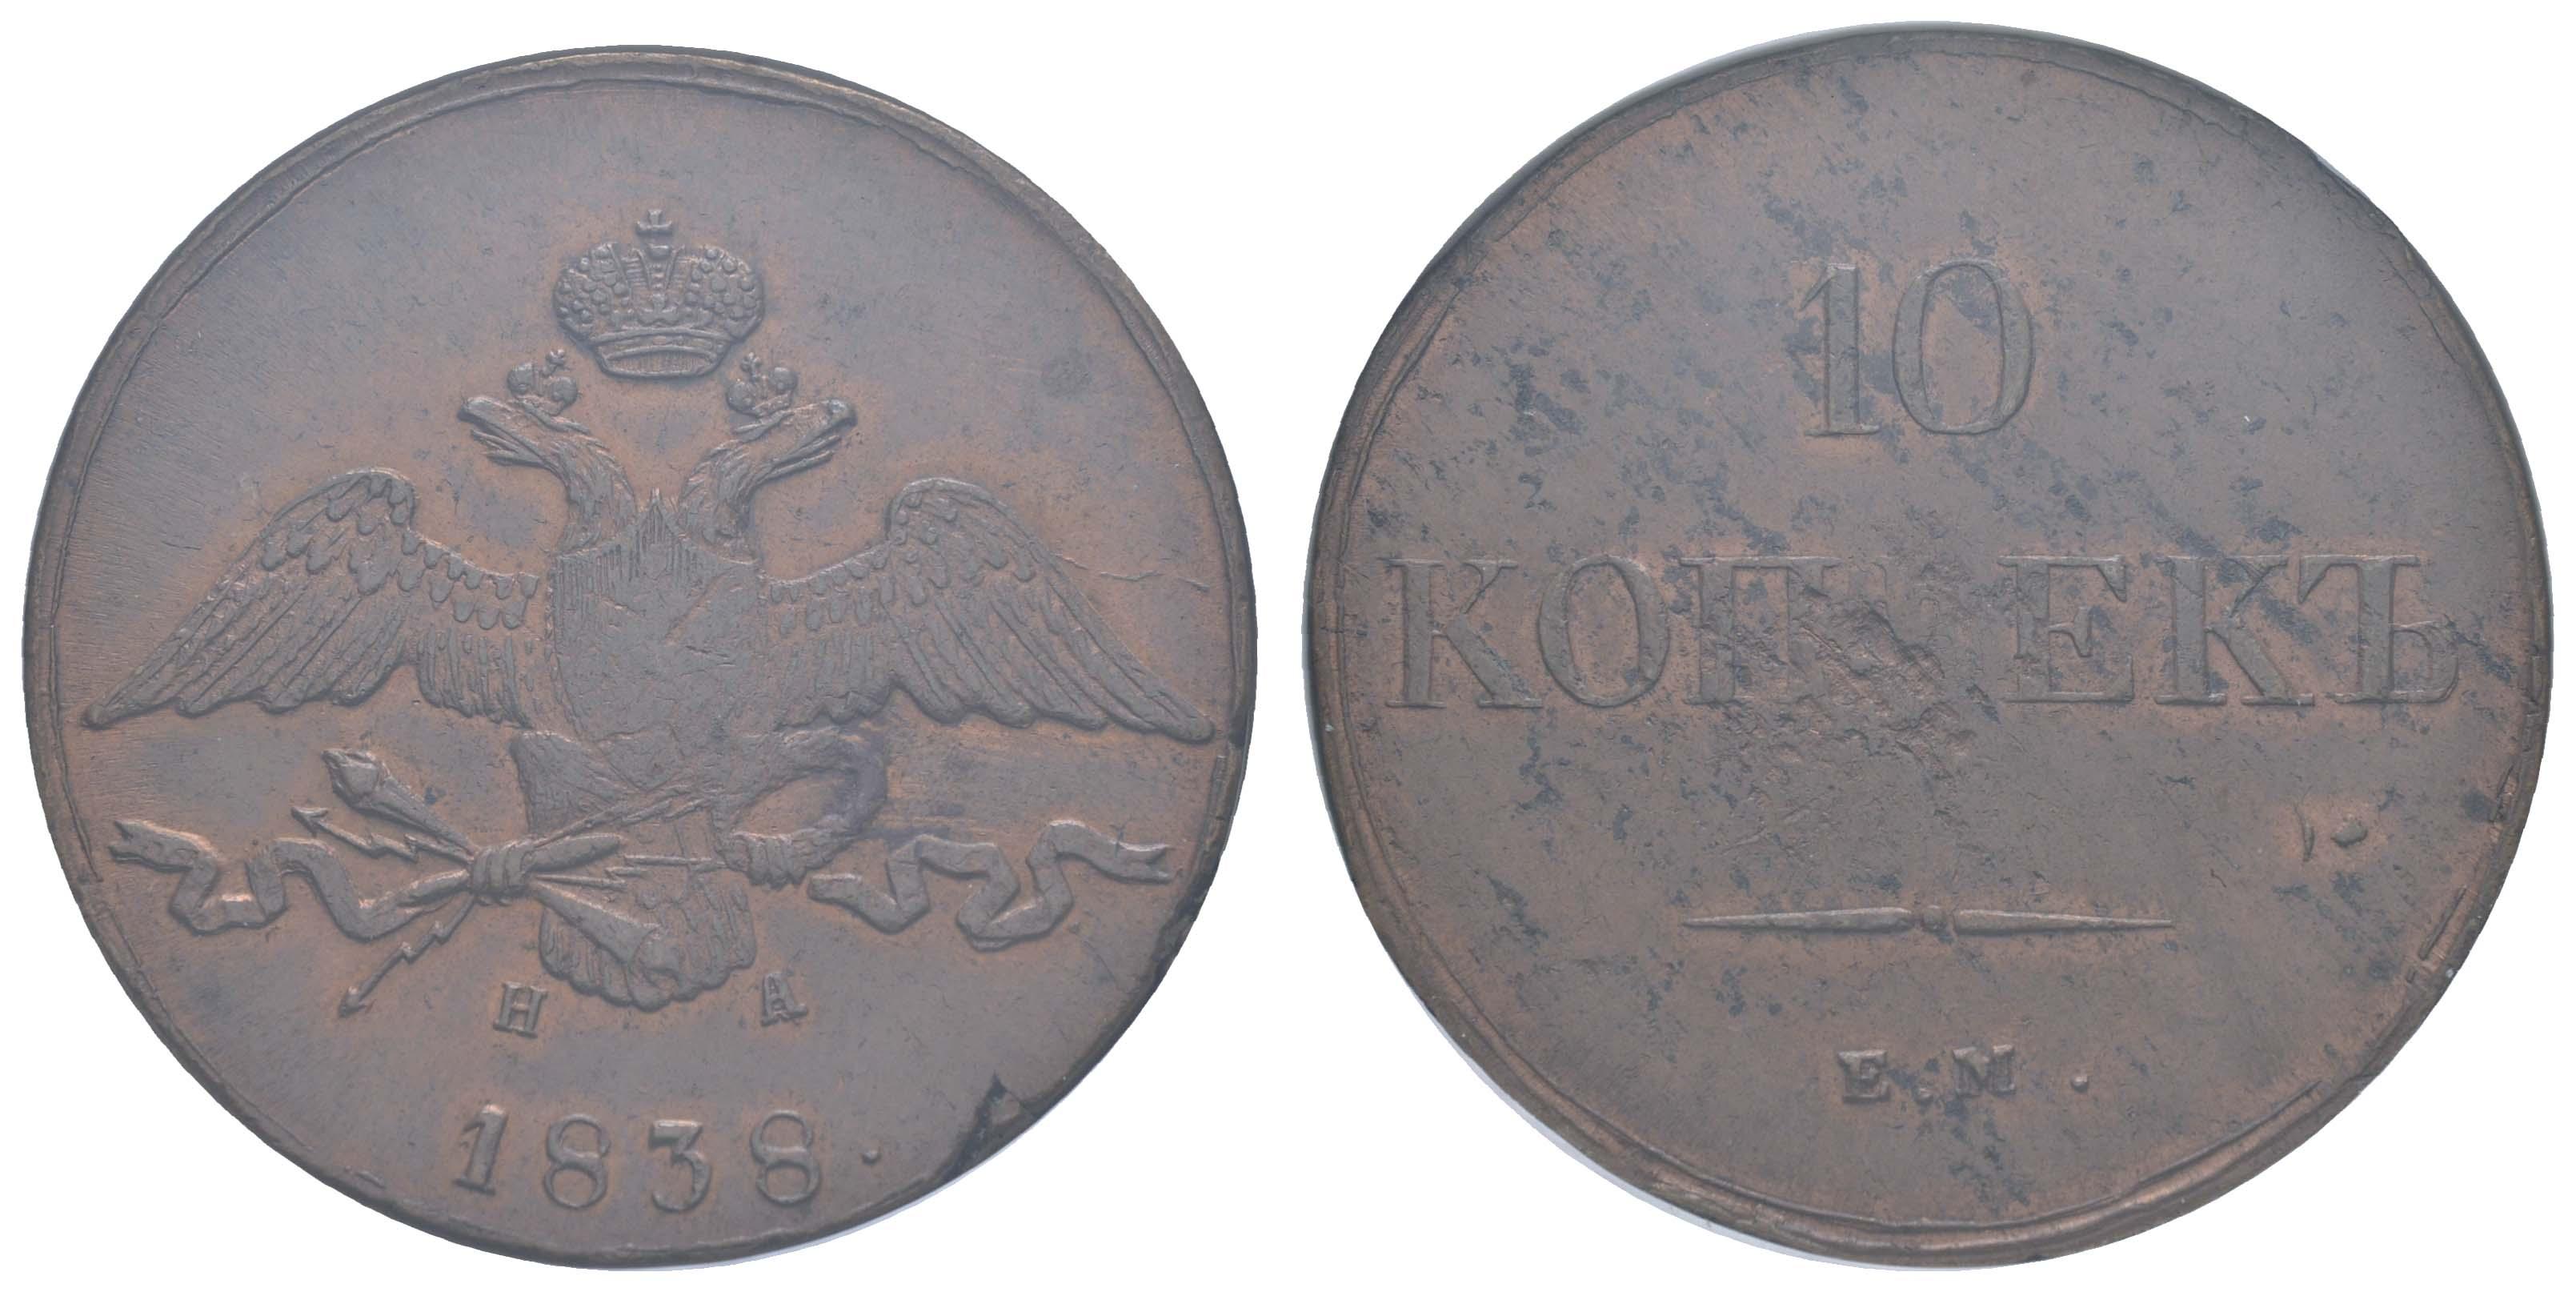 Lot 1346 - Europa ab 1800 Russland  -  Auktionshaus Ulrich Felzmann GmbH & Co. KG Auction 169